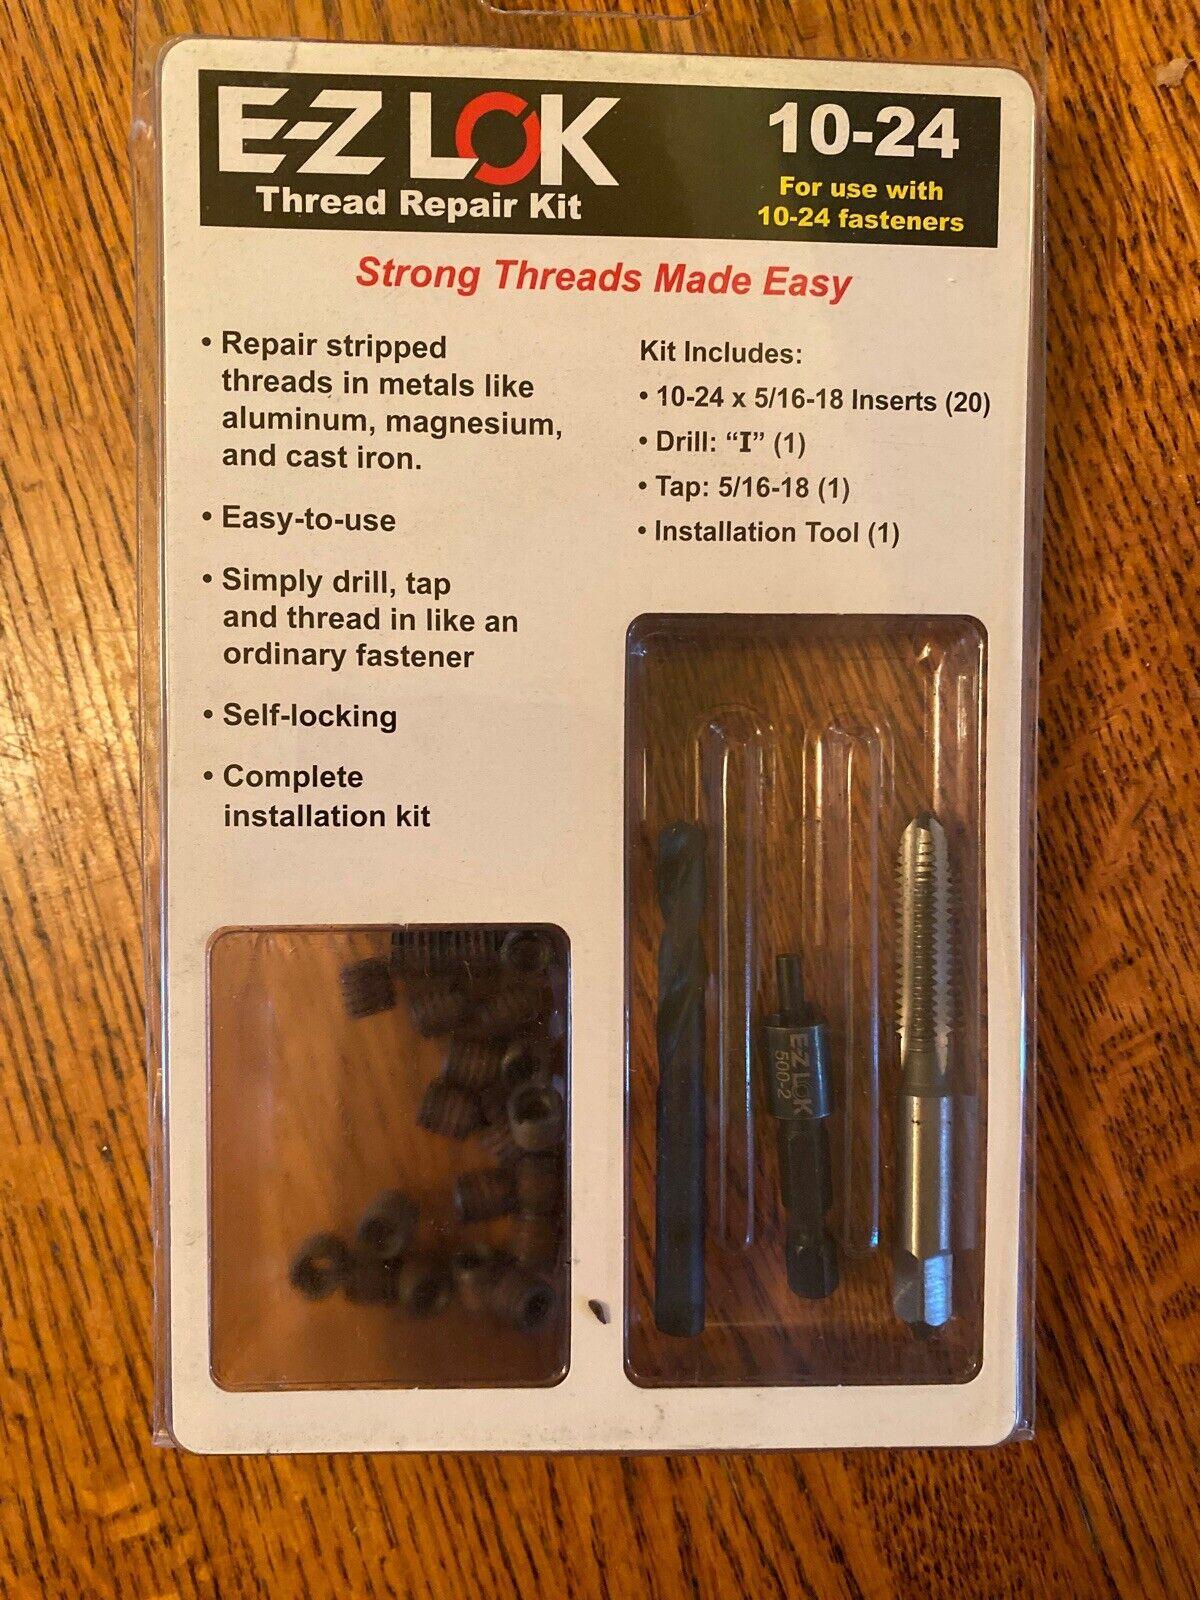 Black Oxide E-Z LOK EZ-329-3 Threaded Inserts for Metal 10-24 Installation Kit Steel